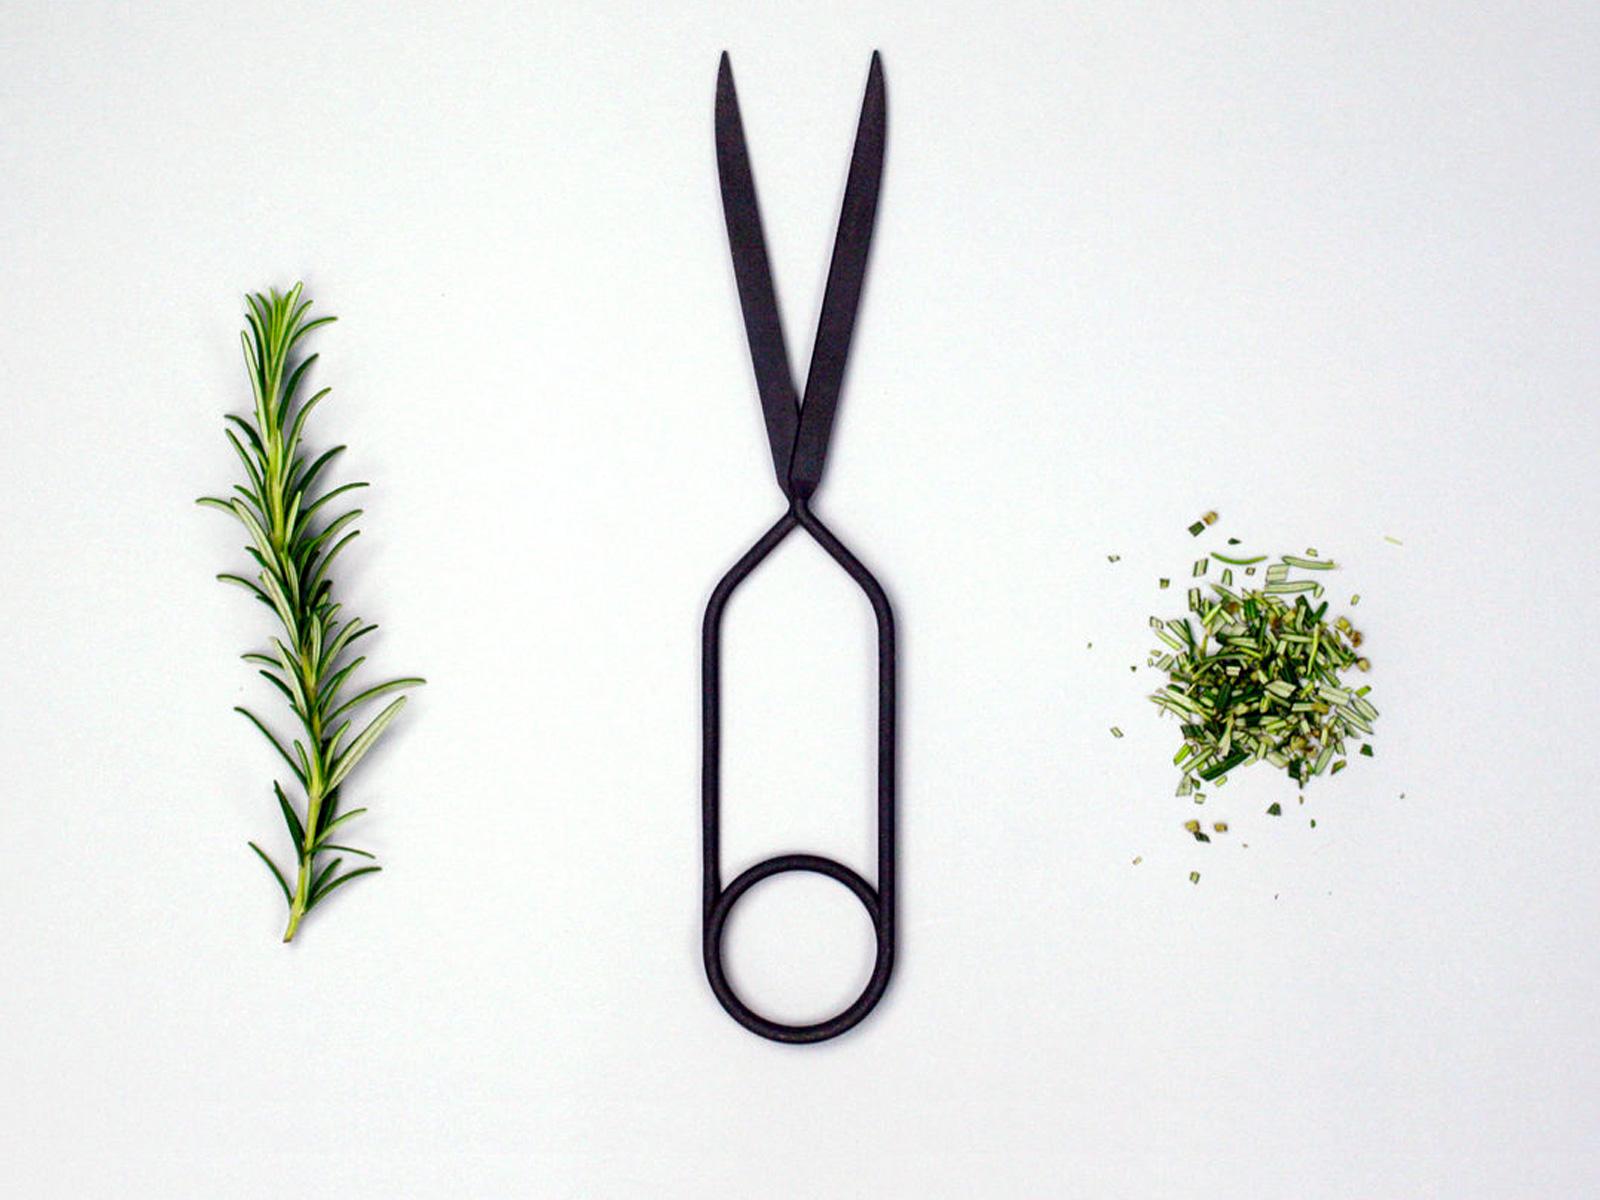 Nomess-Spring-Scissors2